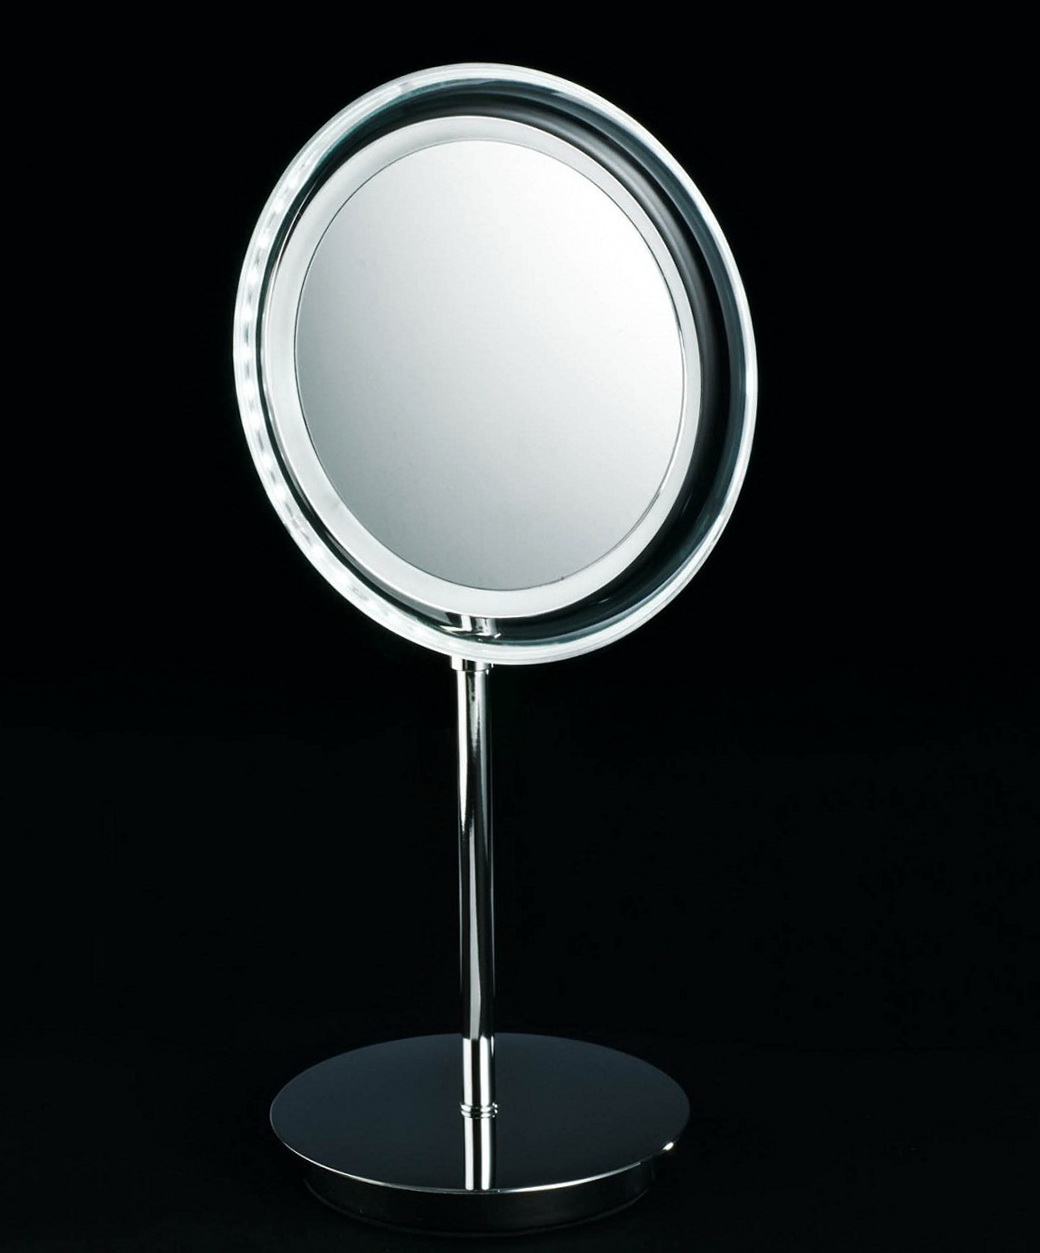 Magnifying Make Up Mirrors